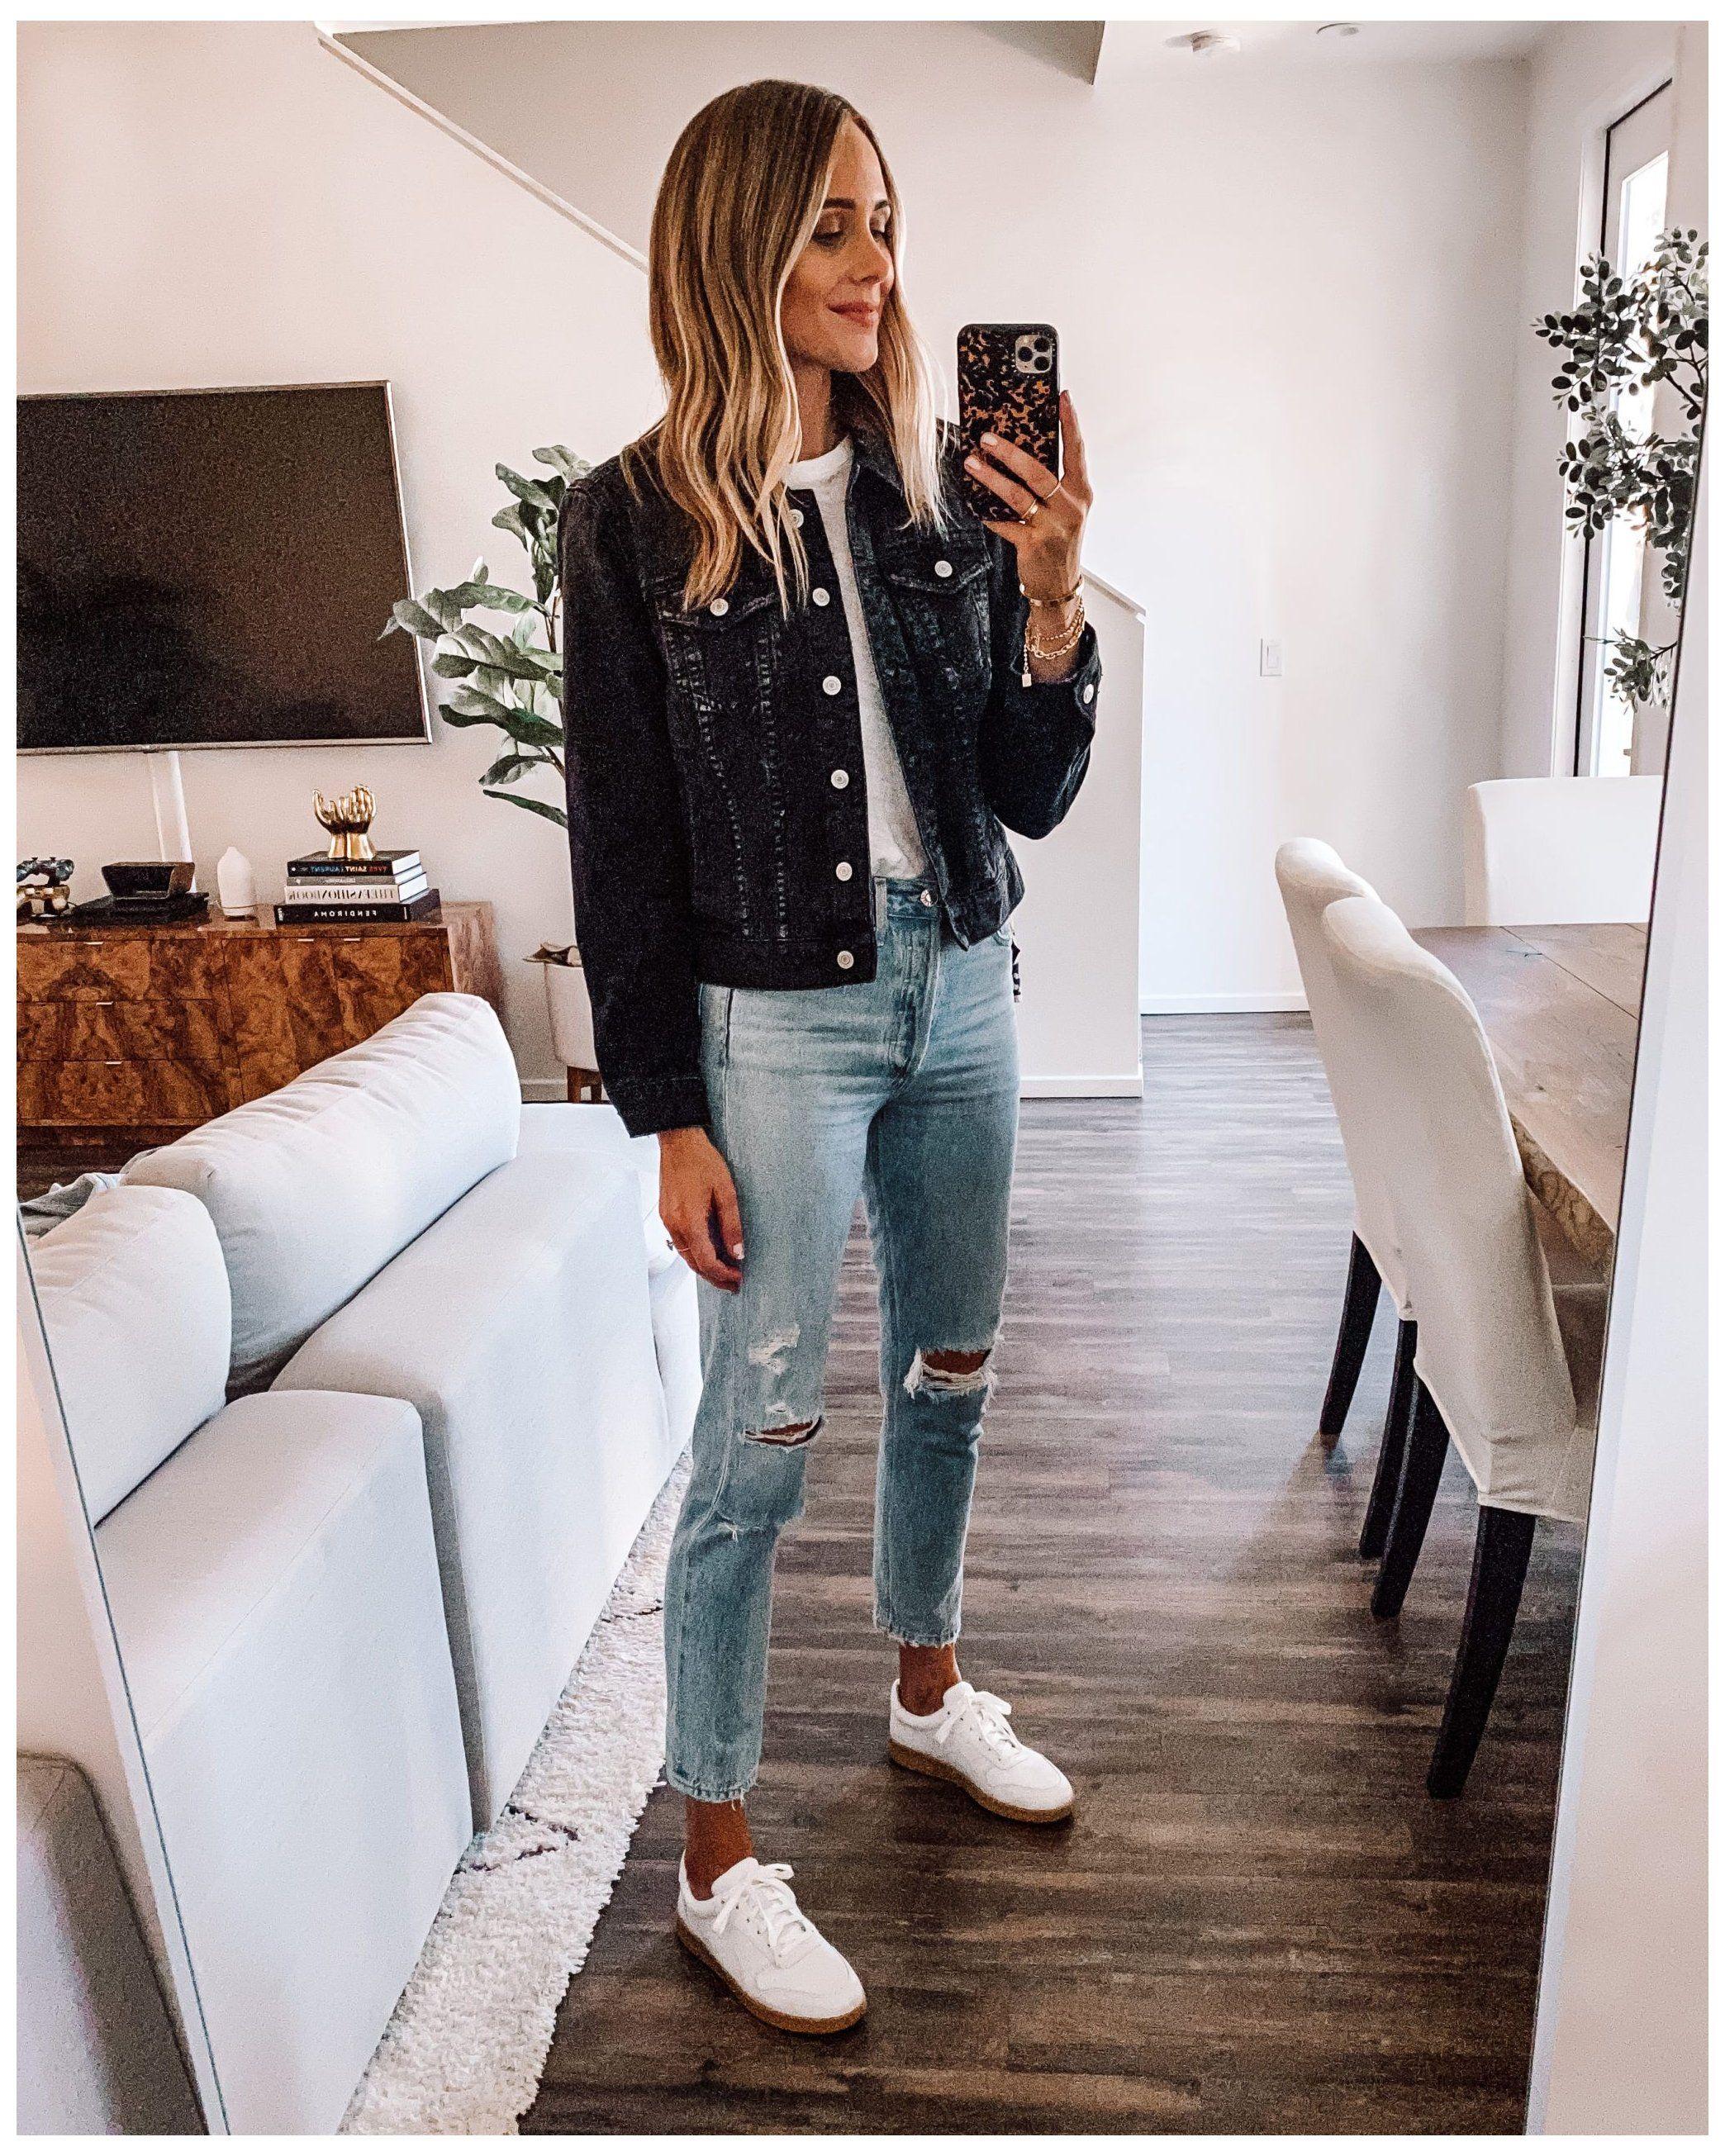 Denim Jacket Guide My Favorite Jean Jacket Styles Outfits With Black Jean Jacket A In 2021 Black Denim Jacket Outfit Denim Jacket Outfit Fall Black Denim Jacket [ 2610 x 2088 Pixel ]